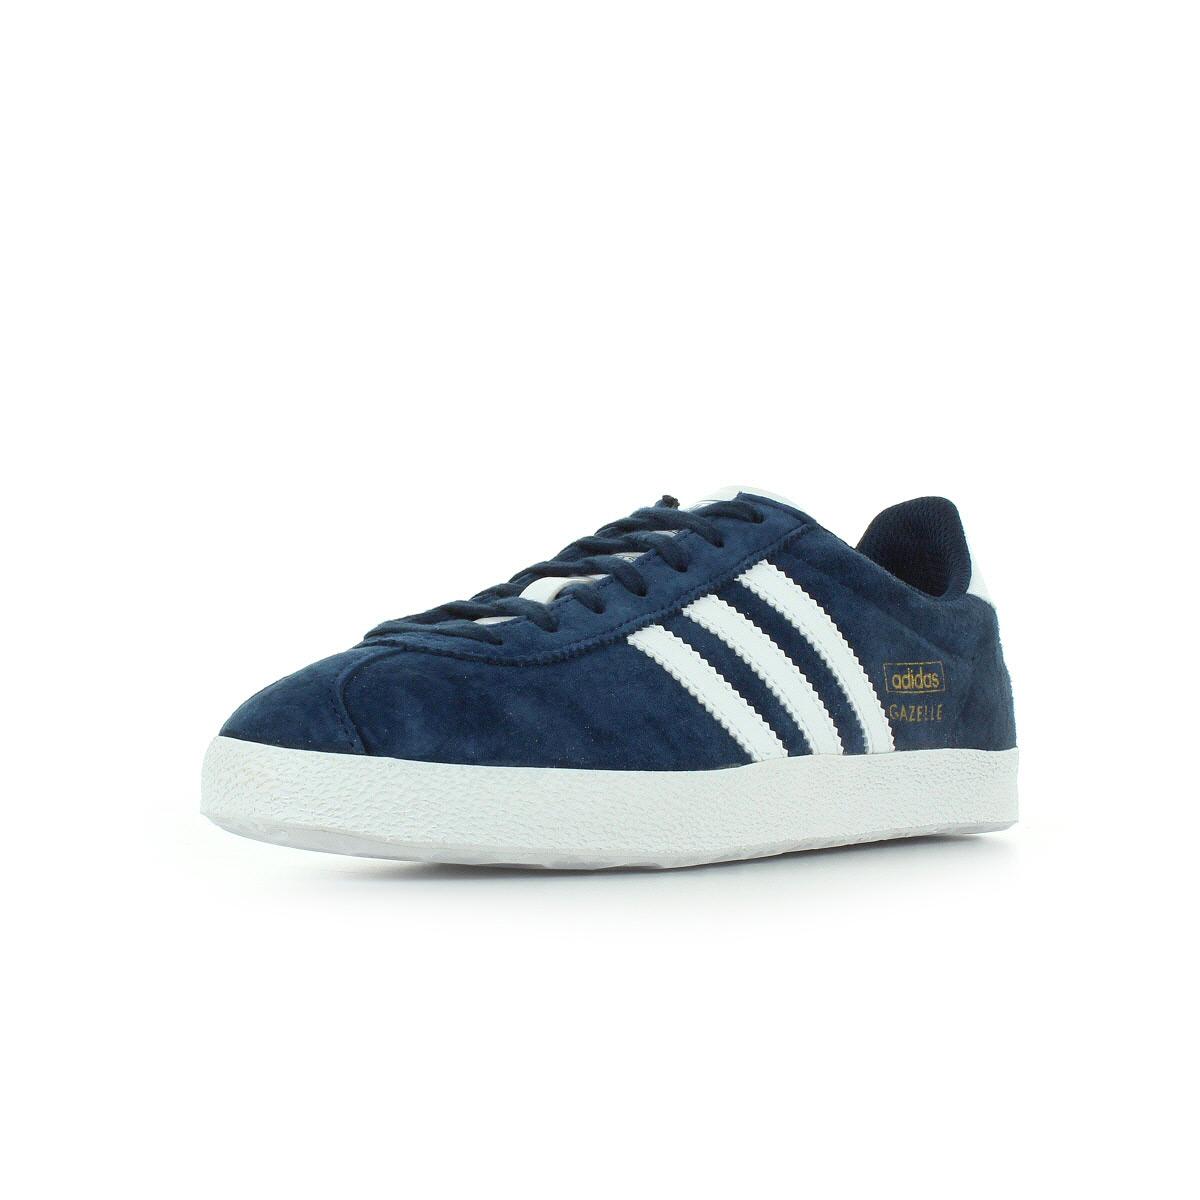 Adidas Gazelle Og baskets bleu marine